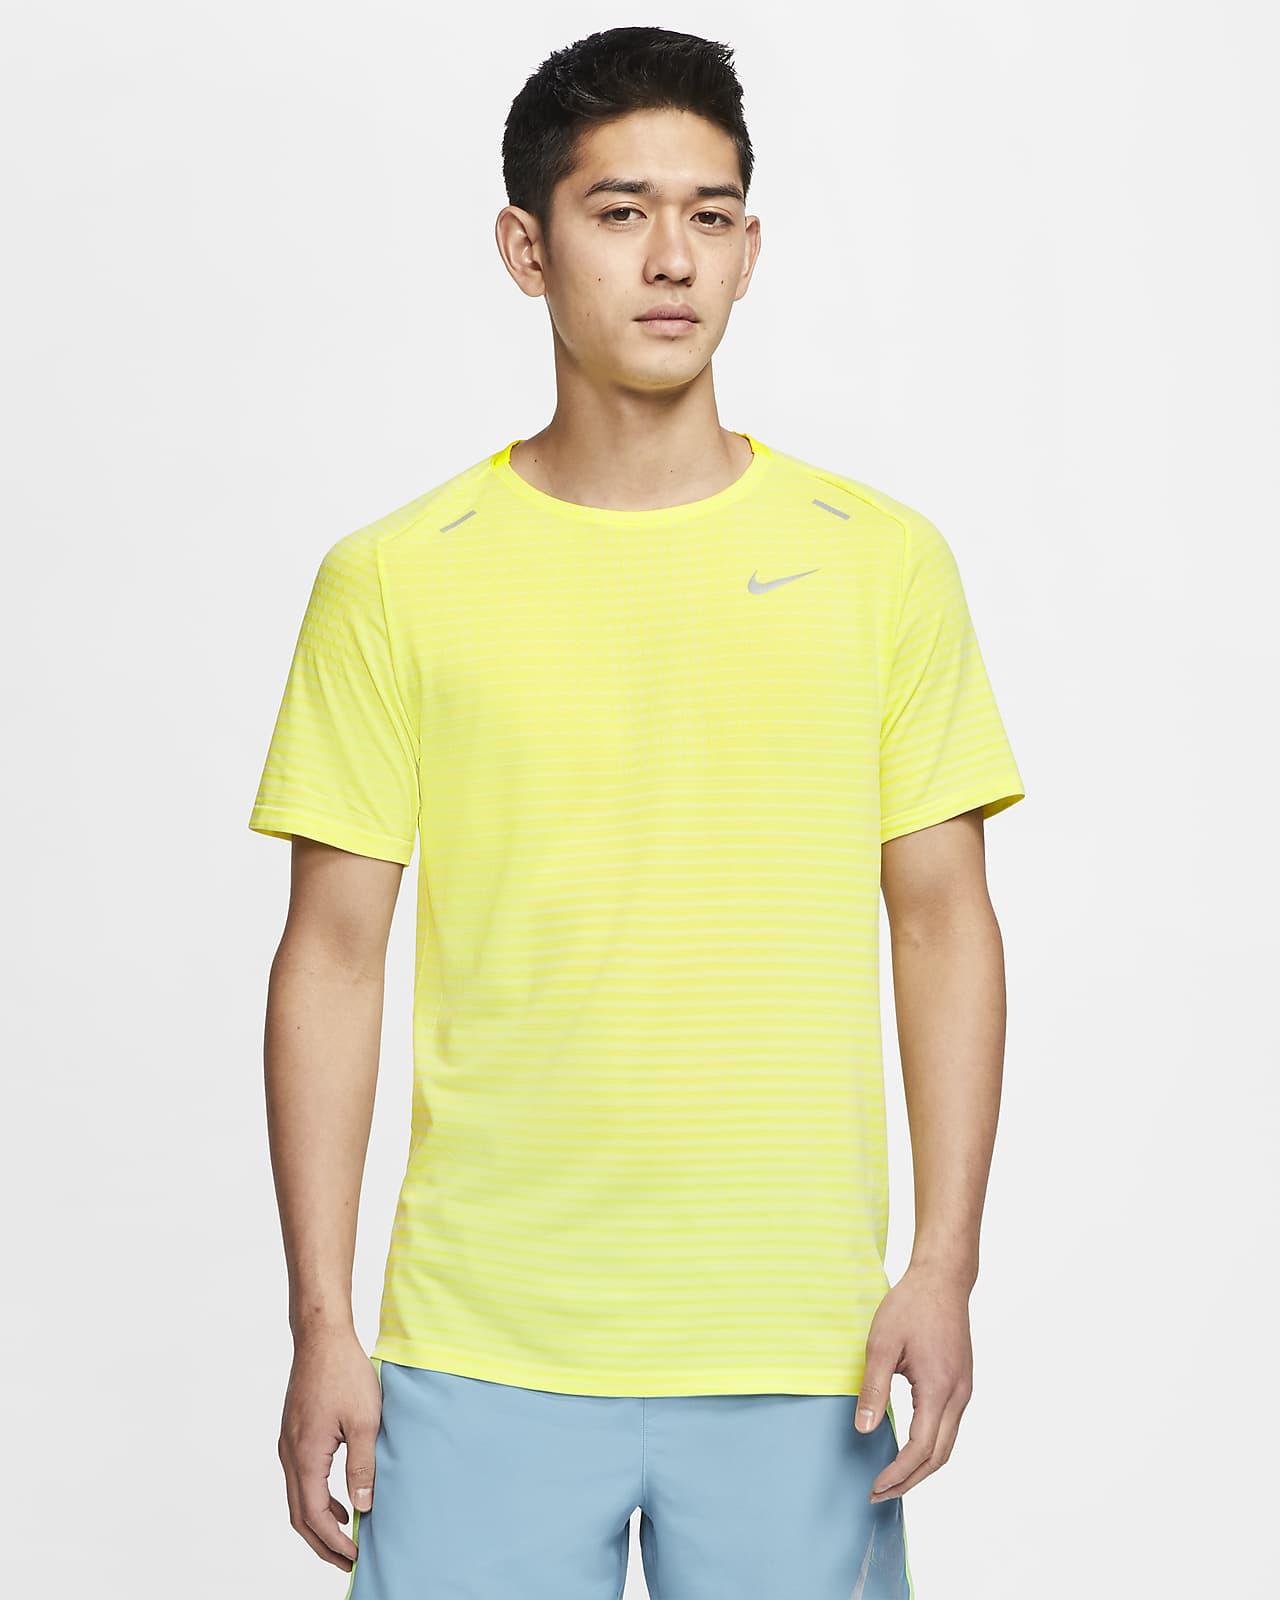 Nike TechKnit Ultra Camiseta de running - Hombre